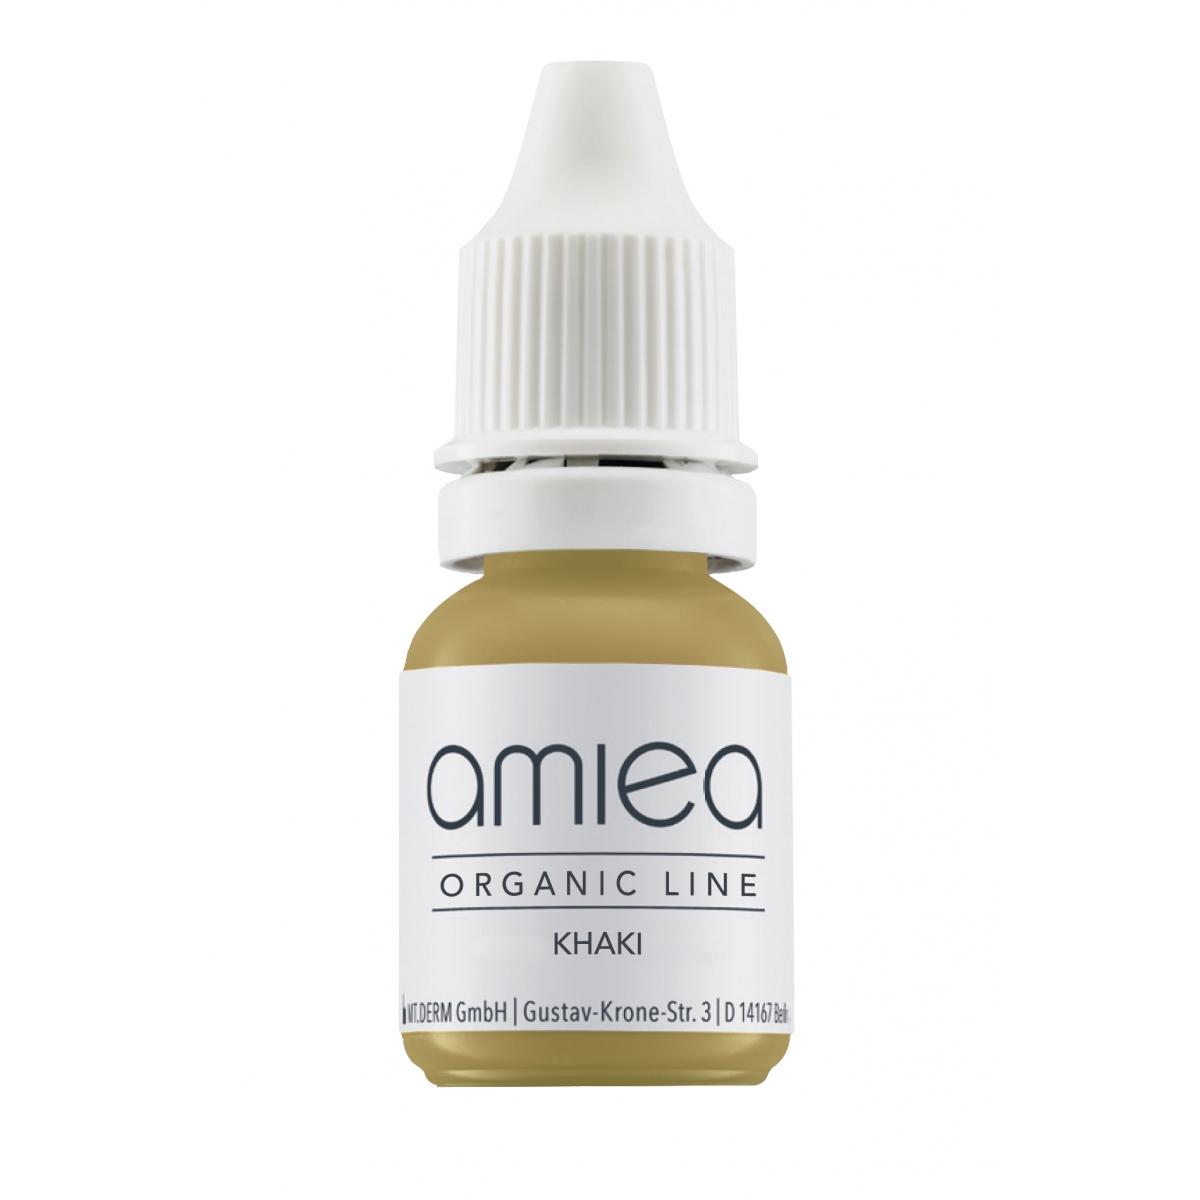 Organicline (5 ml)  - PIGMENTS AMIEA ORGANICLINE CORRECTEUR KHAKI, Flacon 5 ml